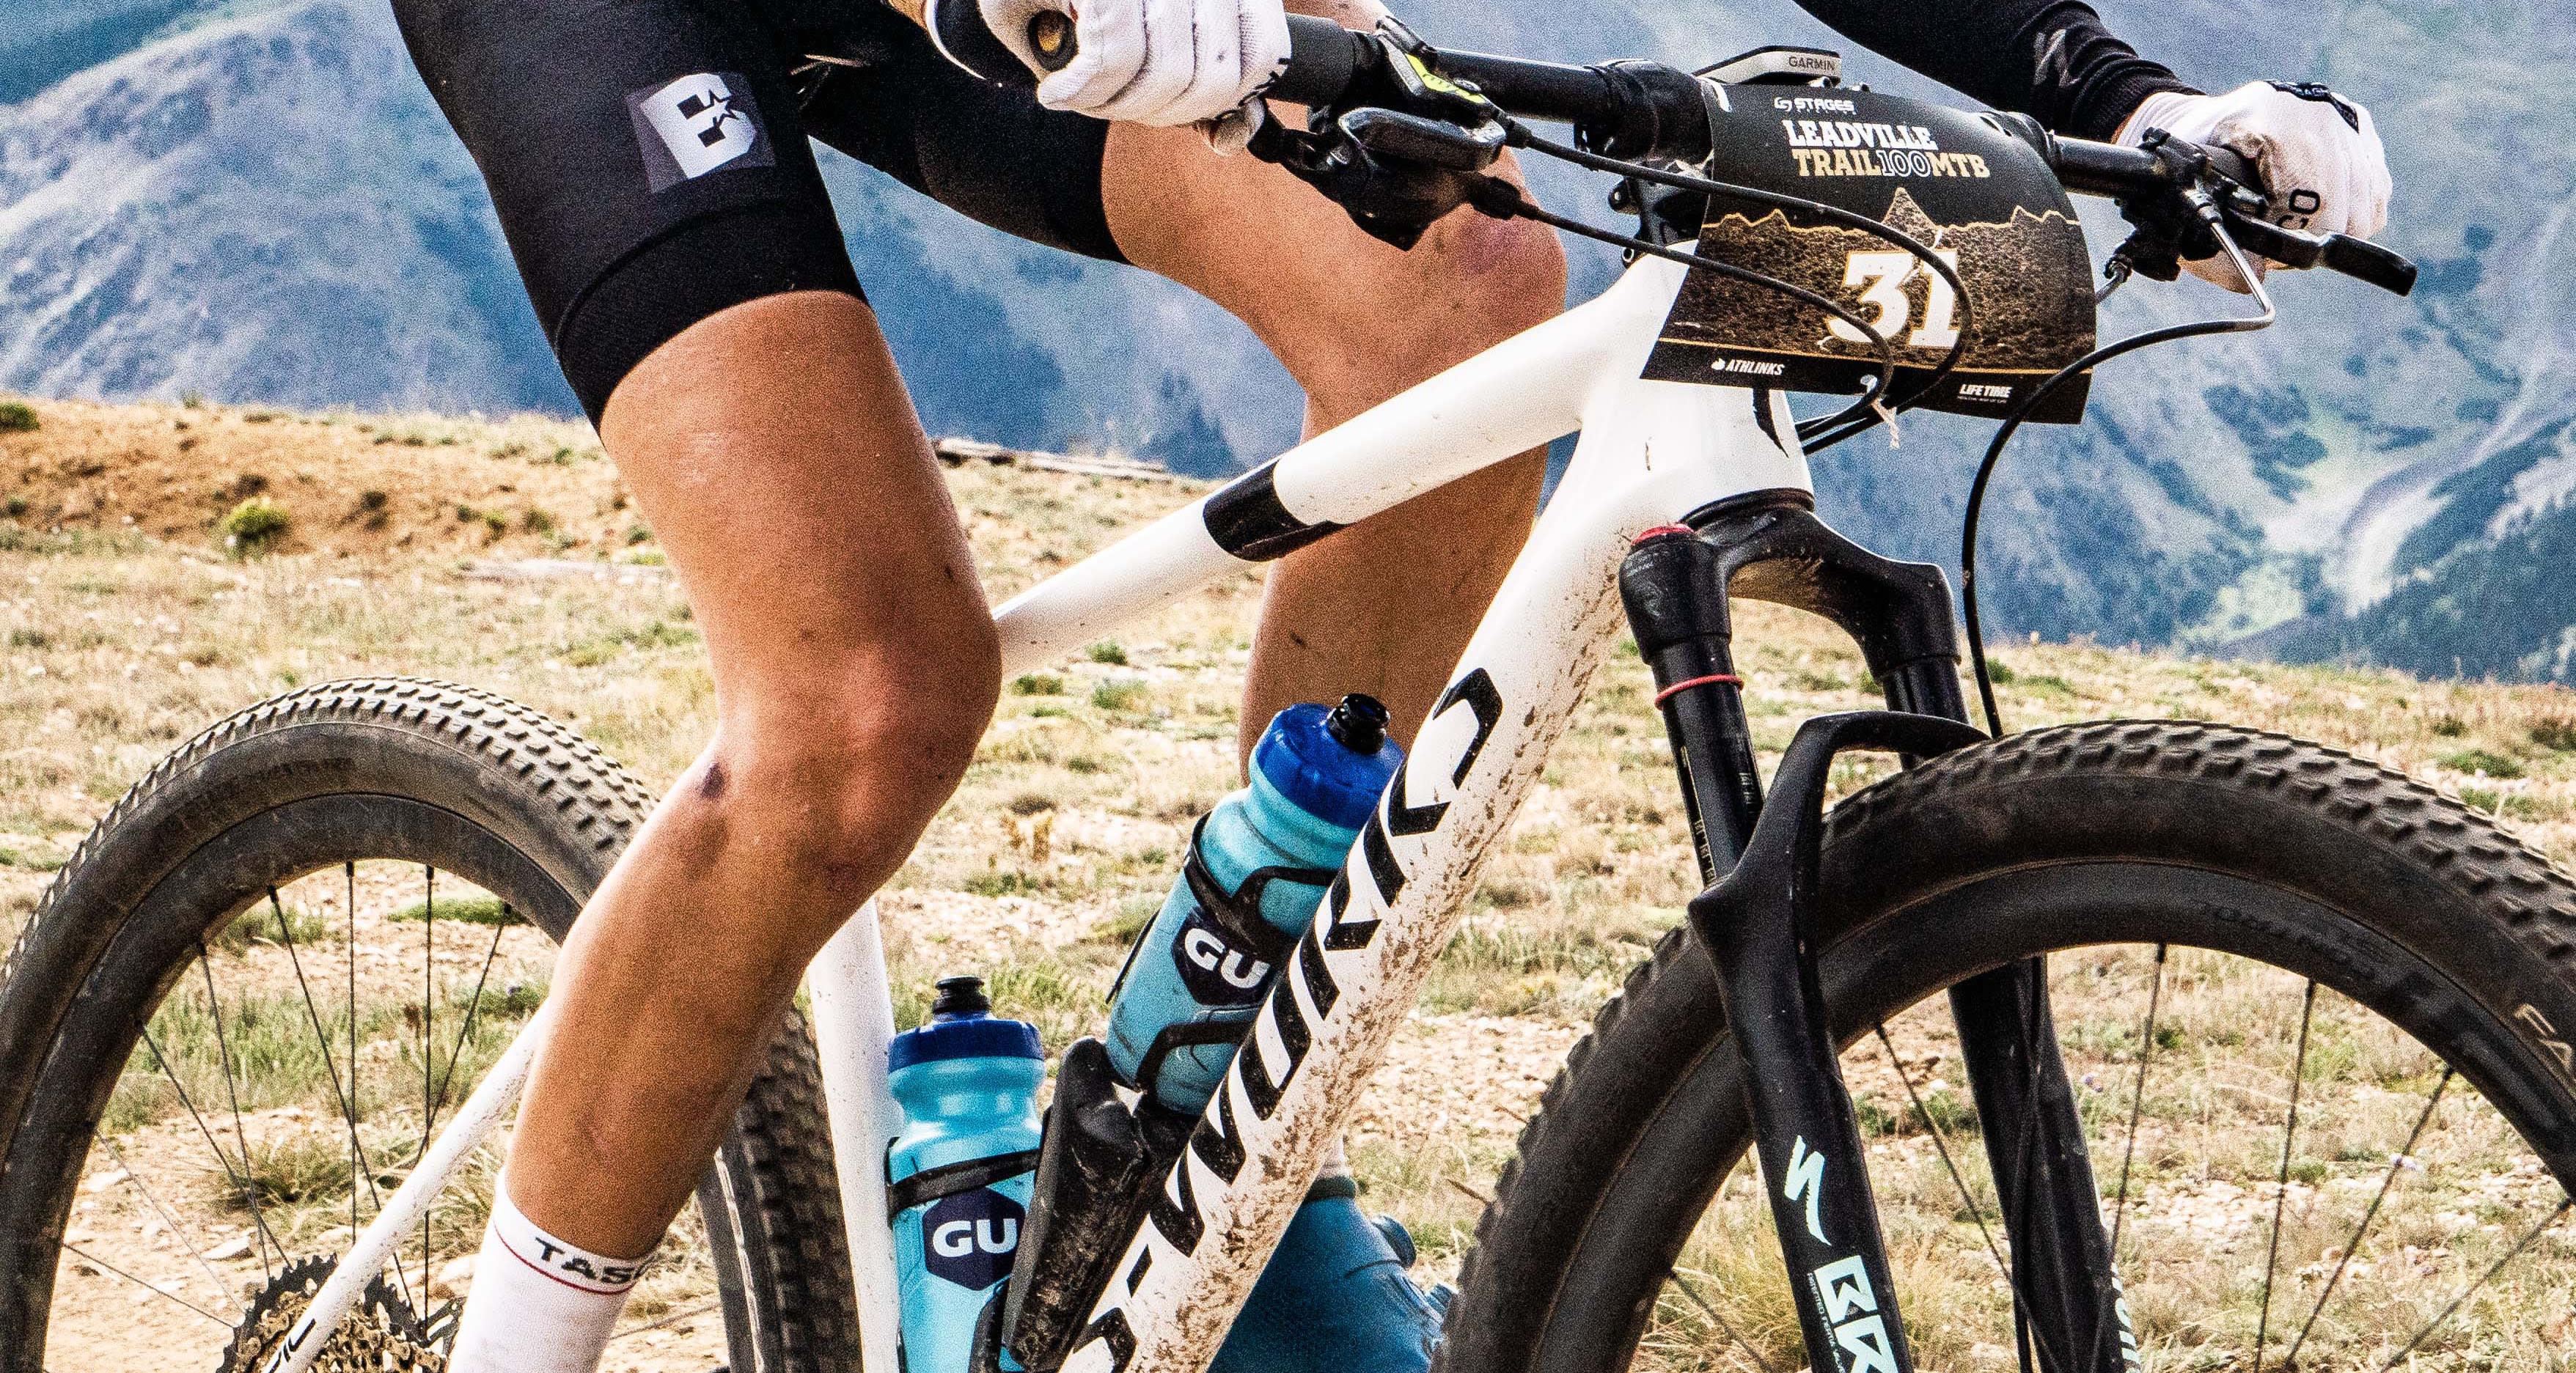 Fuel for the Leadville Trail 100 MTB Race